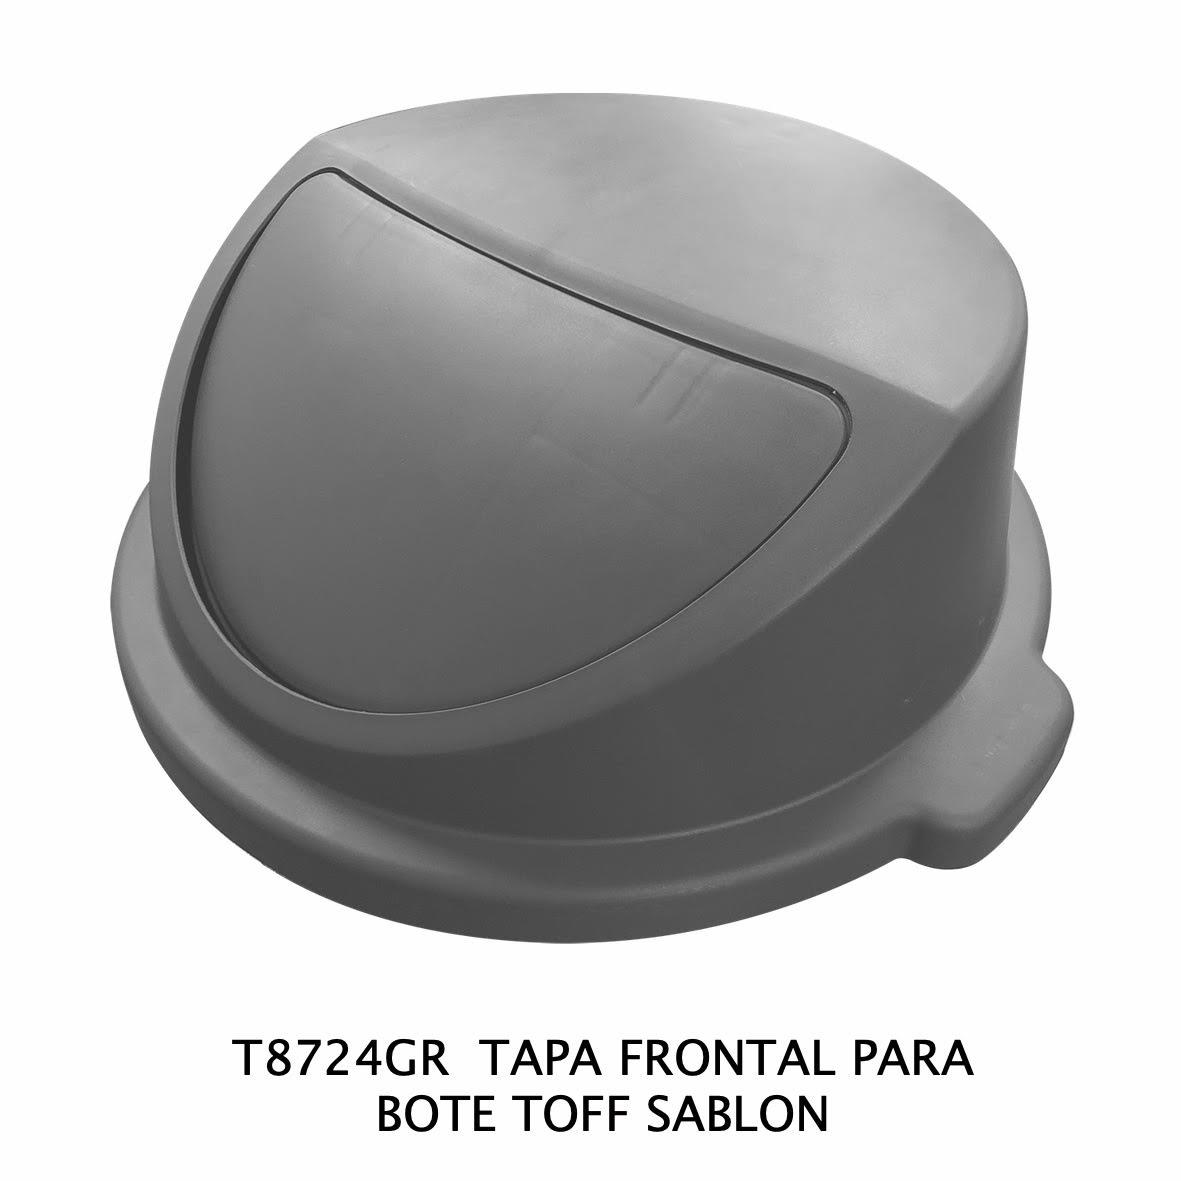 Tapa frontal para bote de basura TOFF color gris modelo T8724GR de Sablón